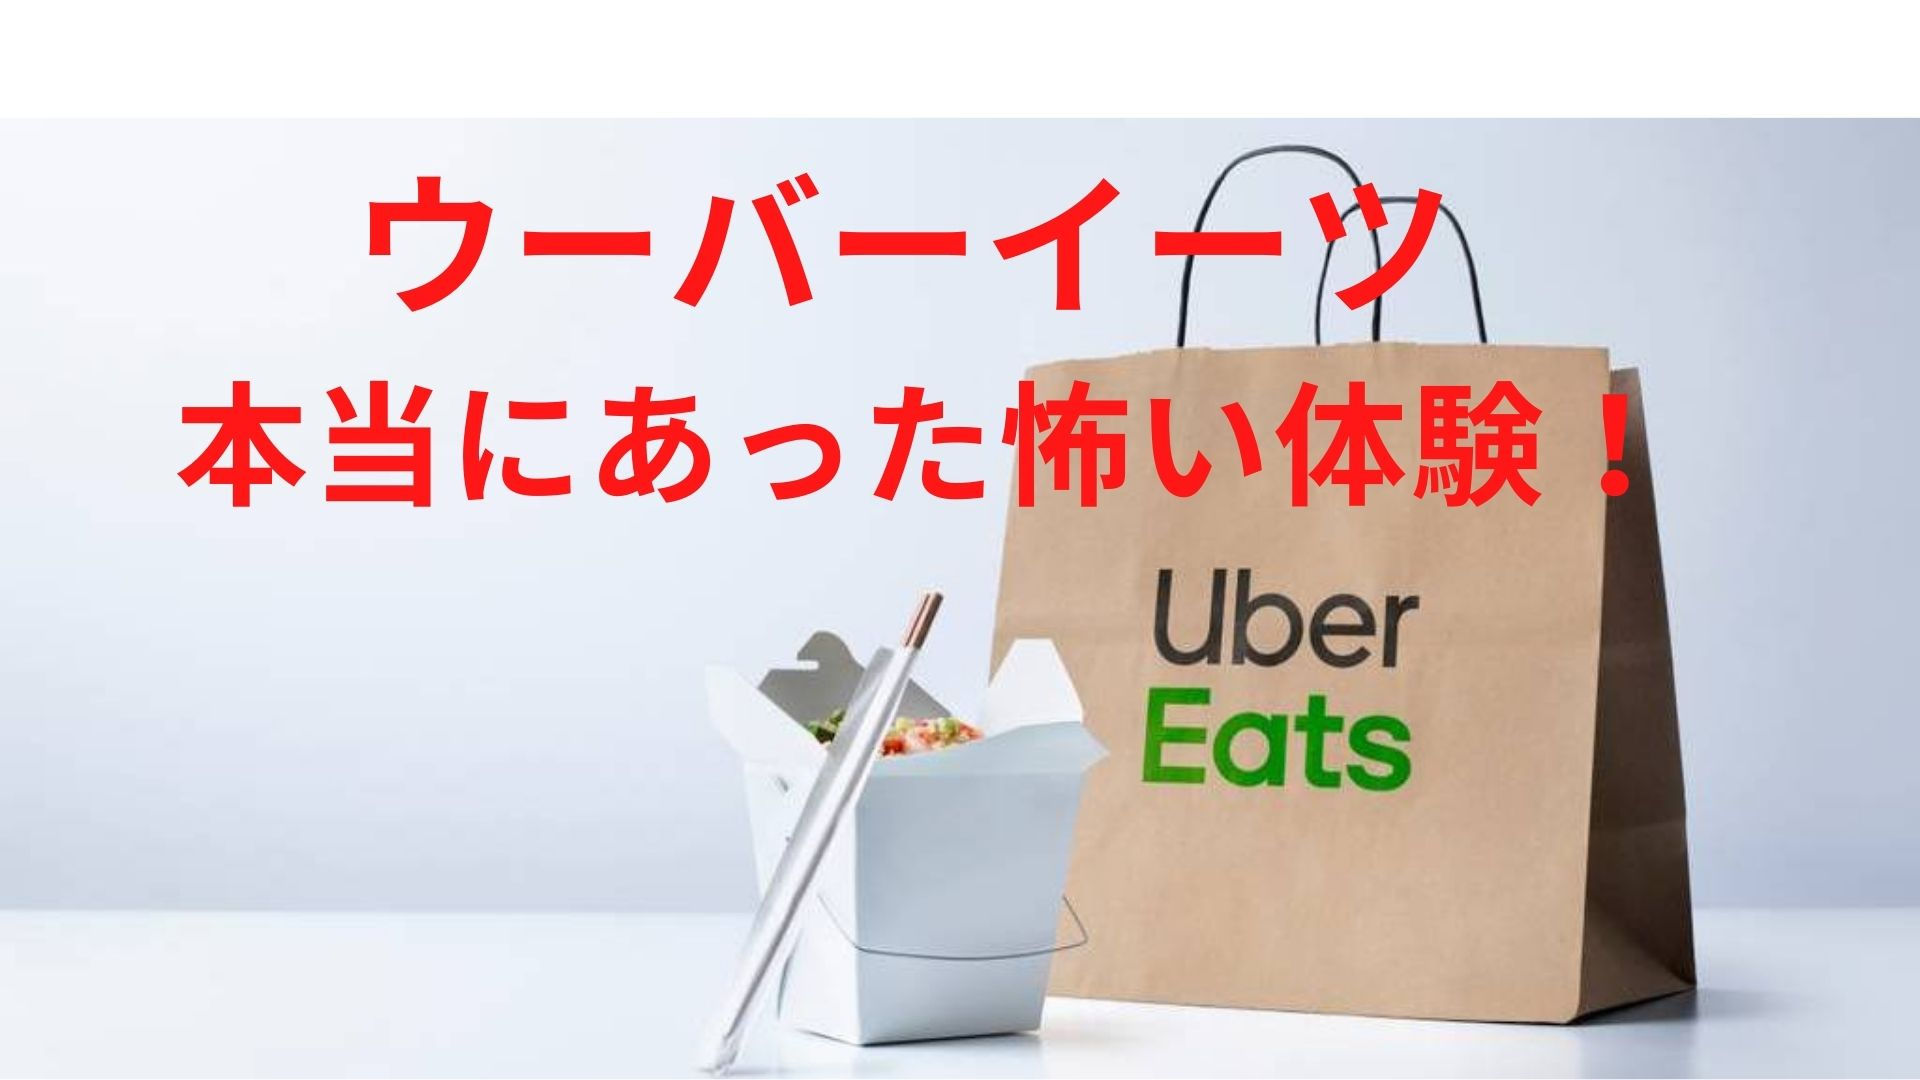 uber-eats-scary-experience